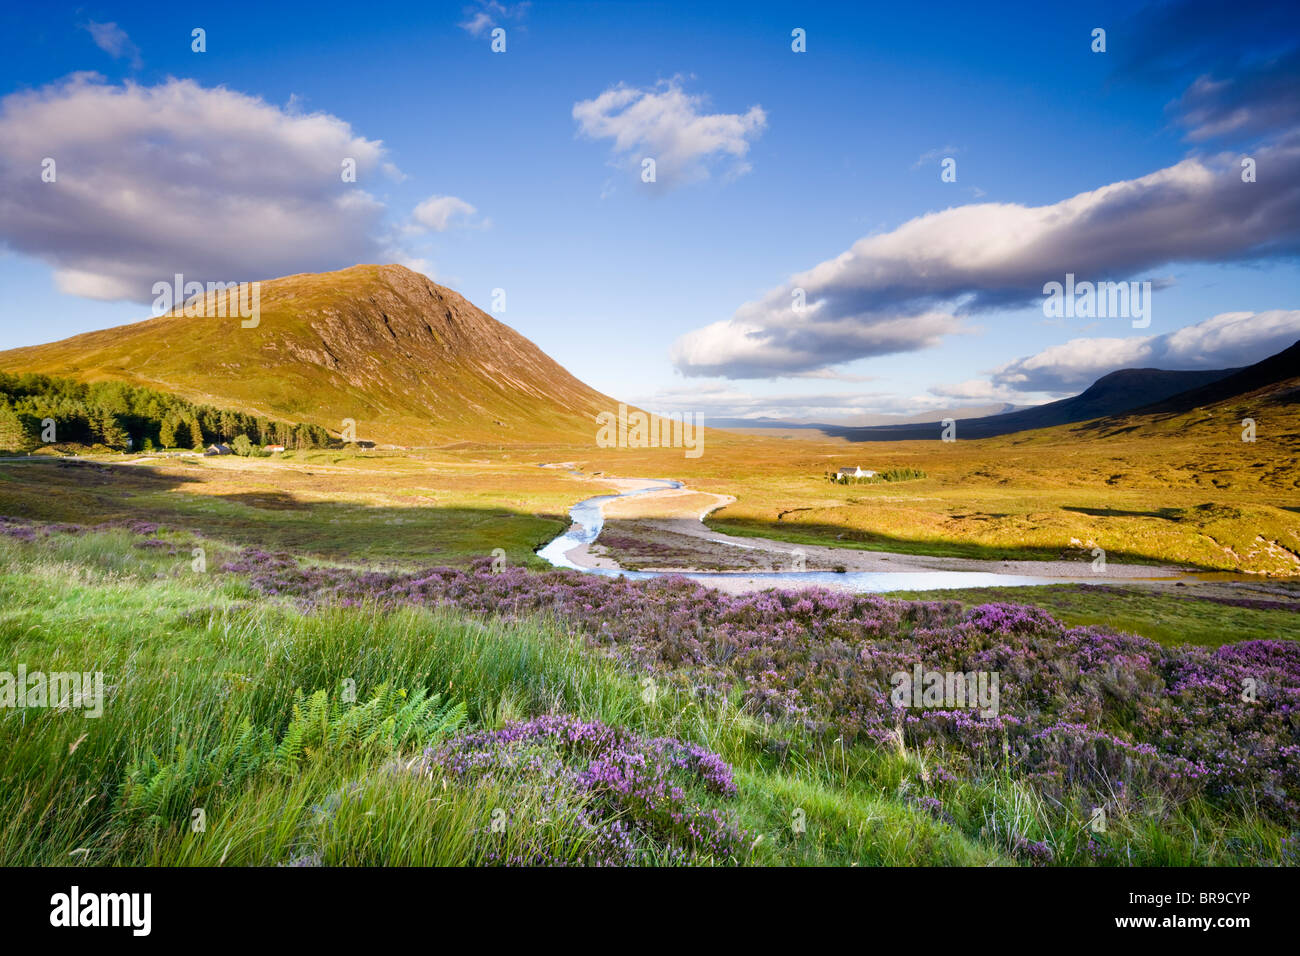 Glencoe. Vue de Rannoch Moor, rivière Coupall en premier plan, Beinn a' Chrulaiste sur la gauche. Highland, Photo Stock